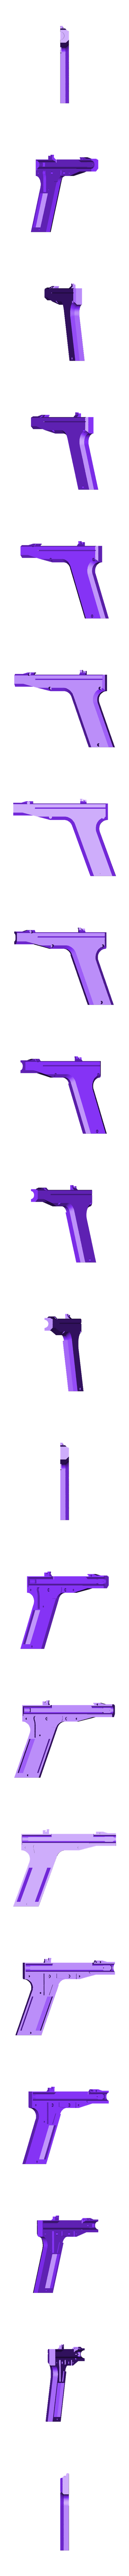 Nerfpistol_body2_v1.2.STL Download STL file Nerf pistol with clip • 3D printer design, MrCrankyface